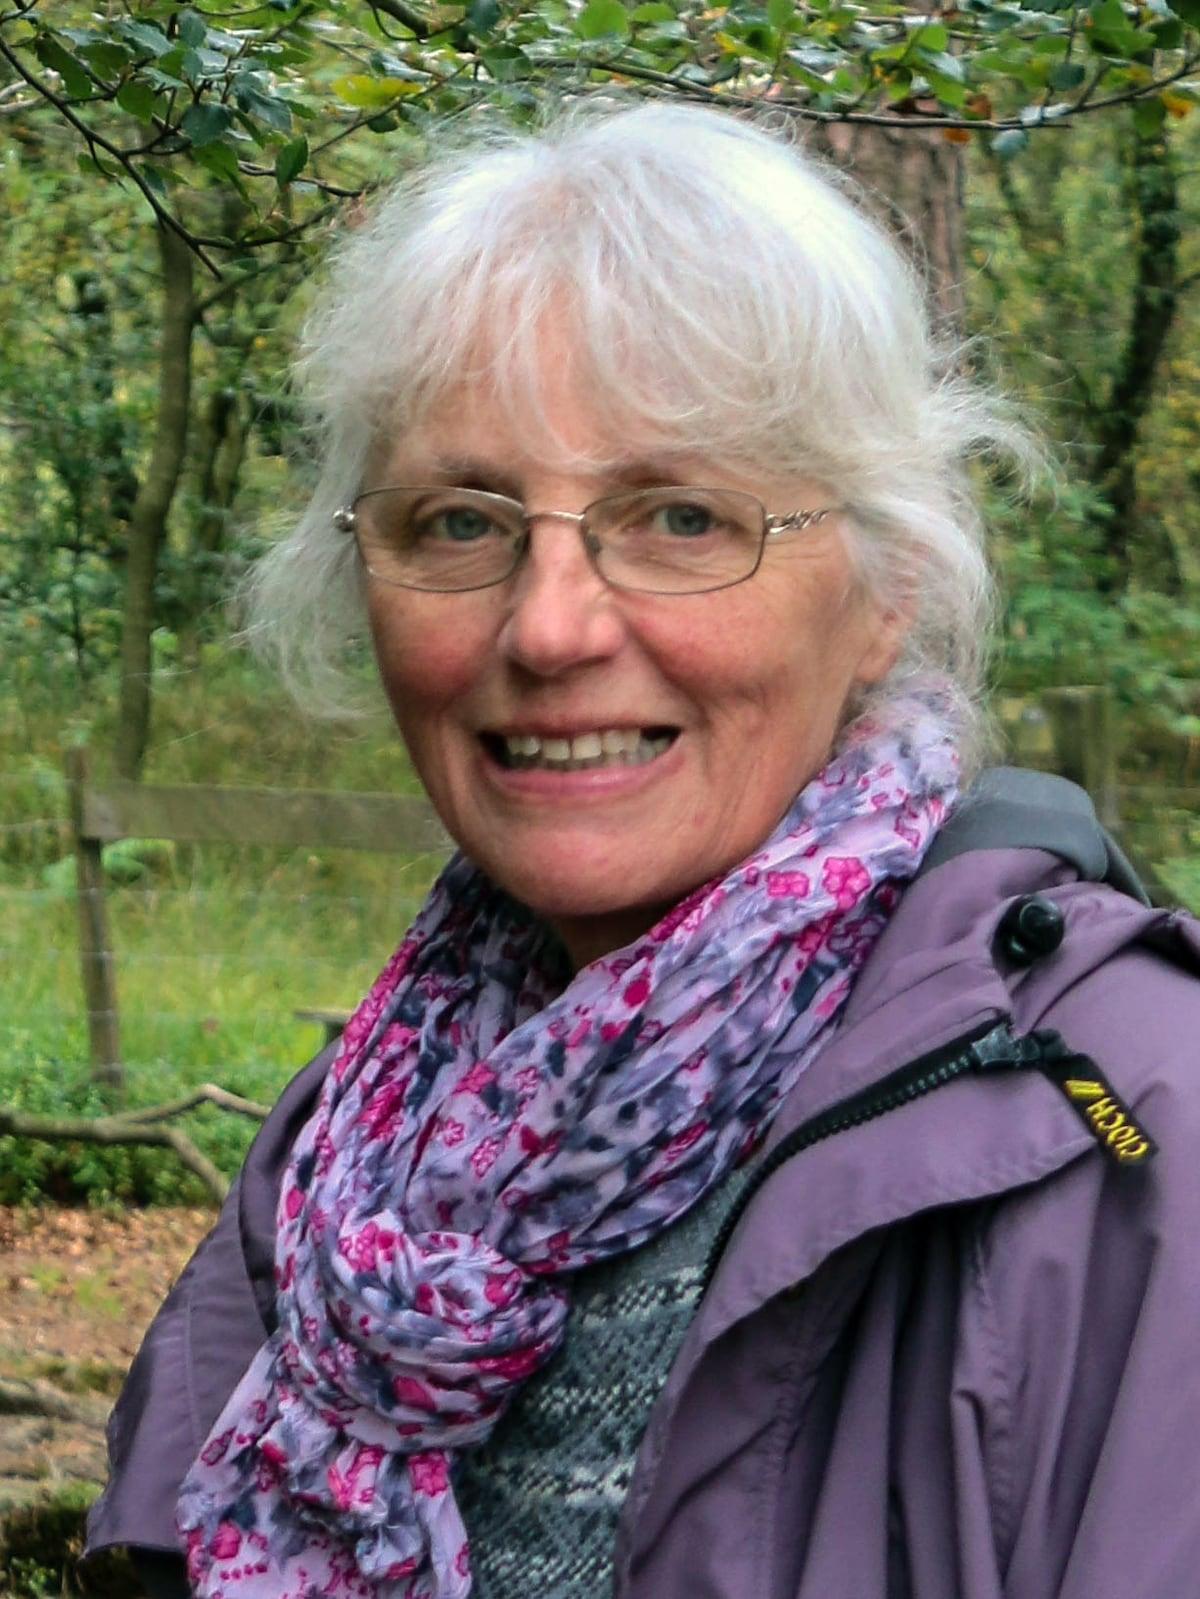 Kathy from Edinbane